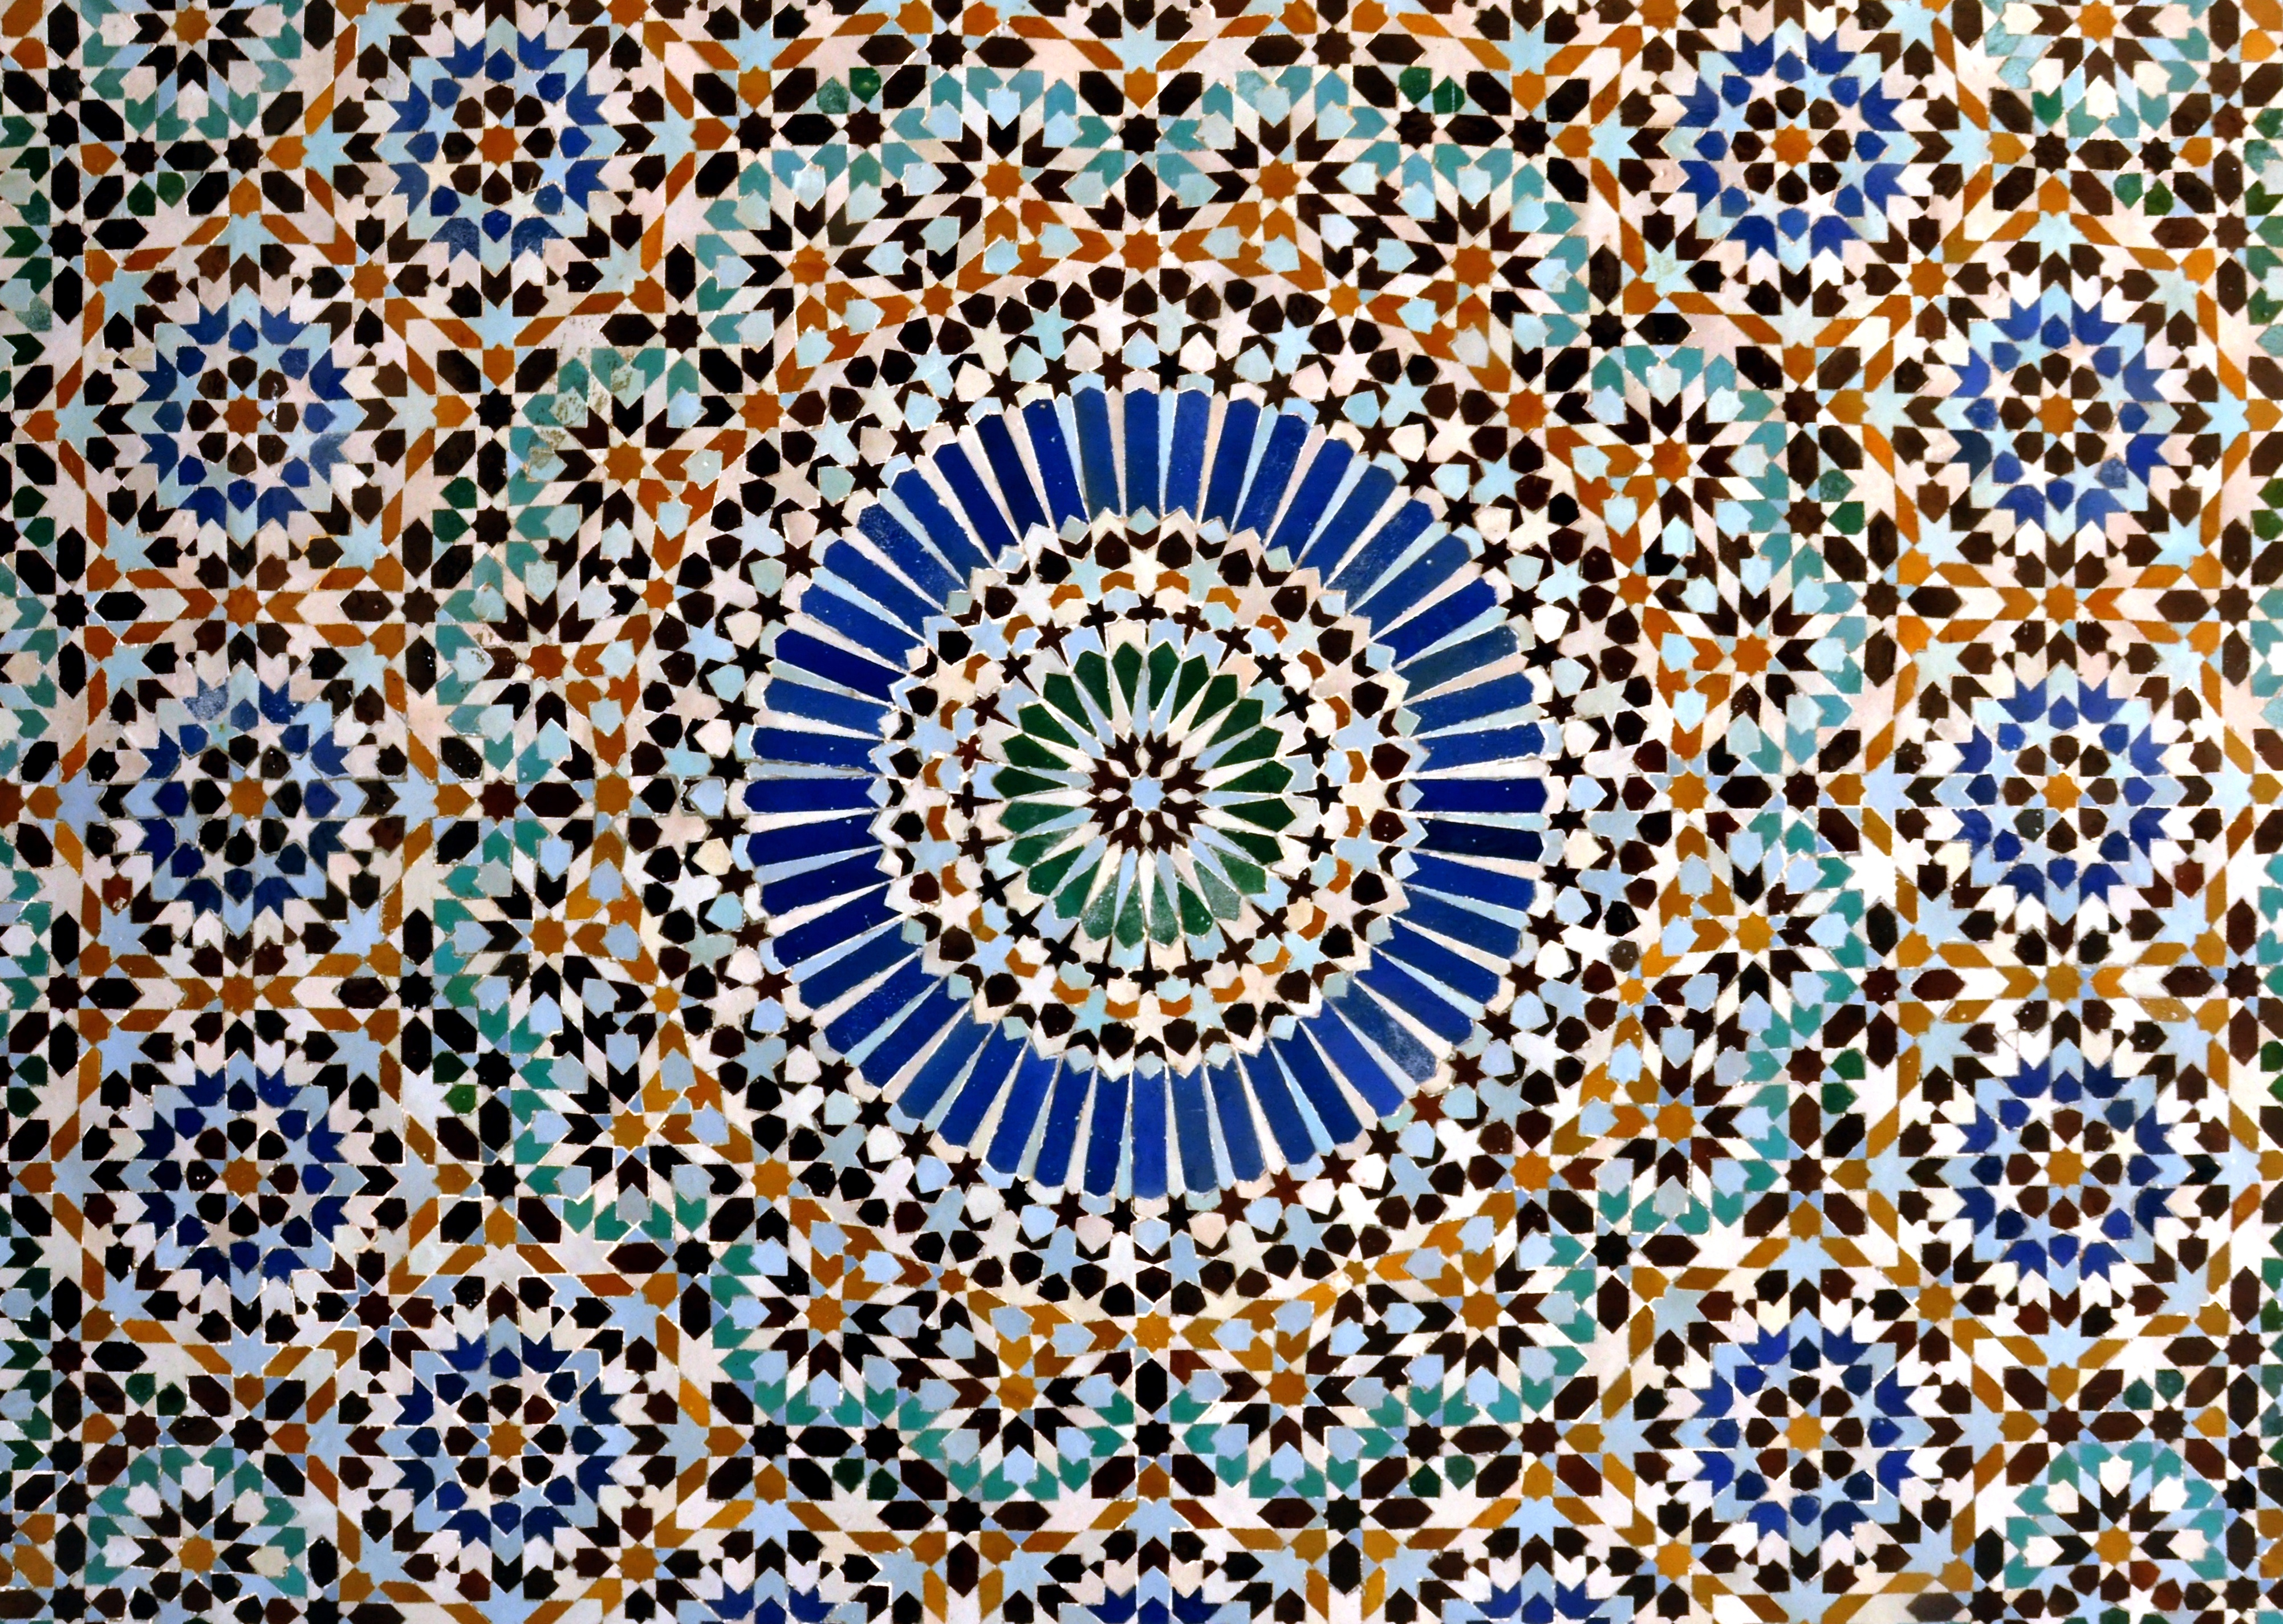 Http Commons Wikimedia Org Wiki File Mosaic Mosqu C3 A9e De Paris Jpg